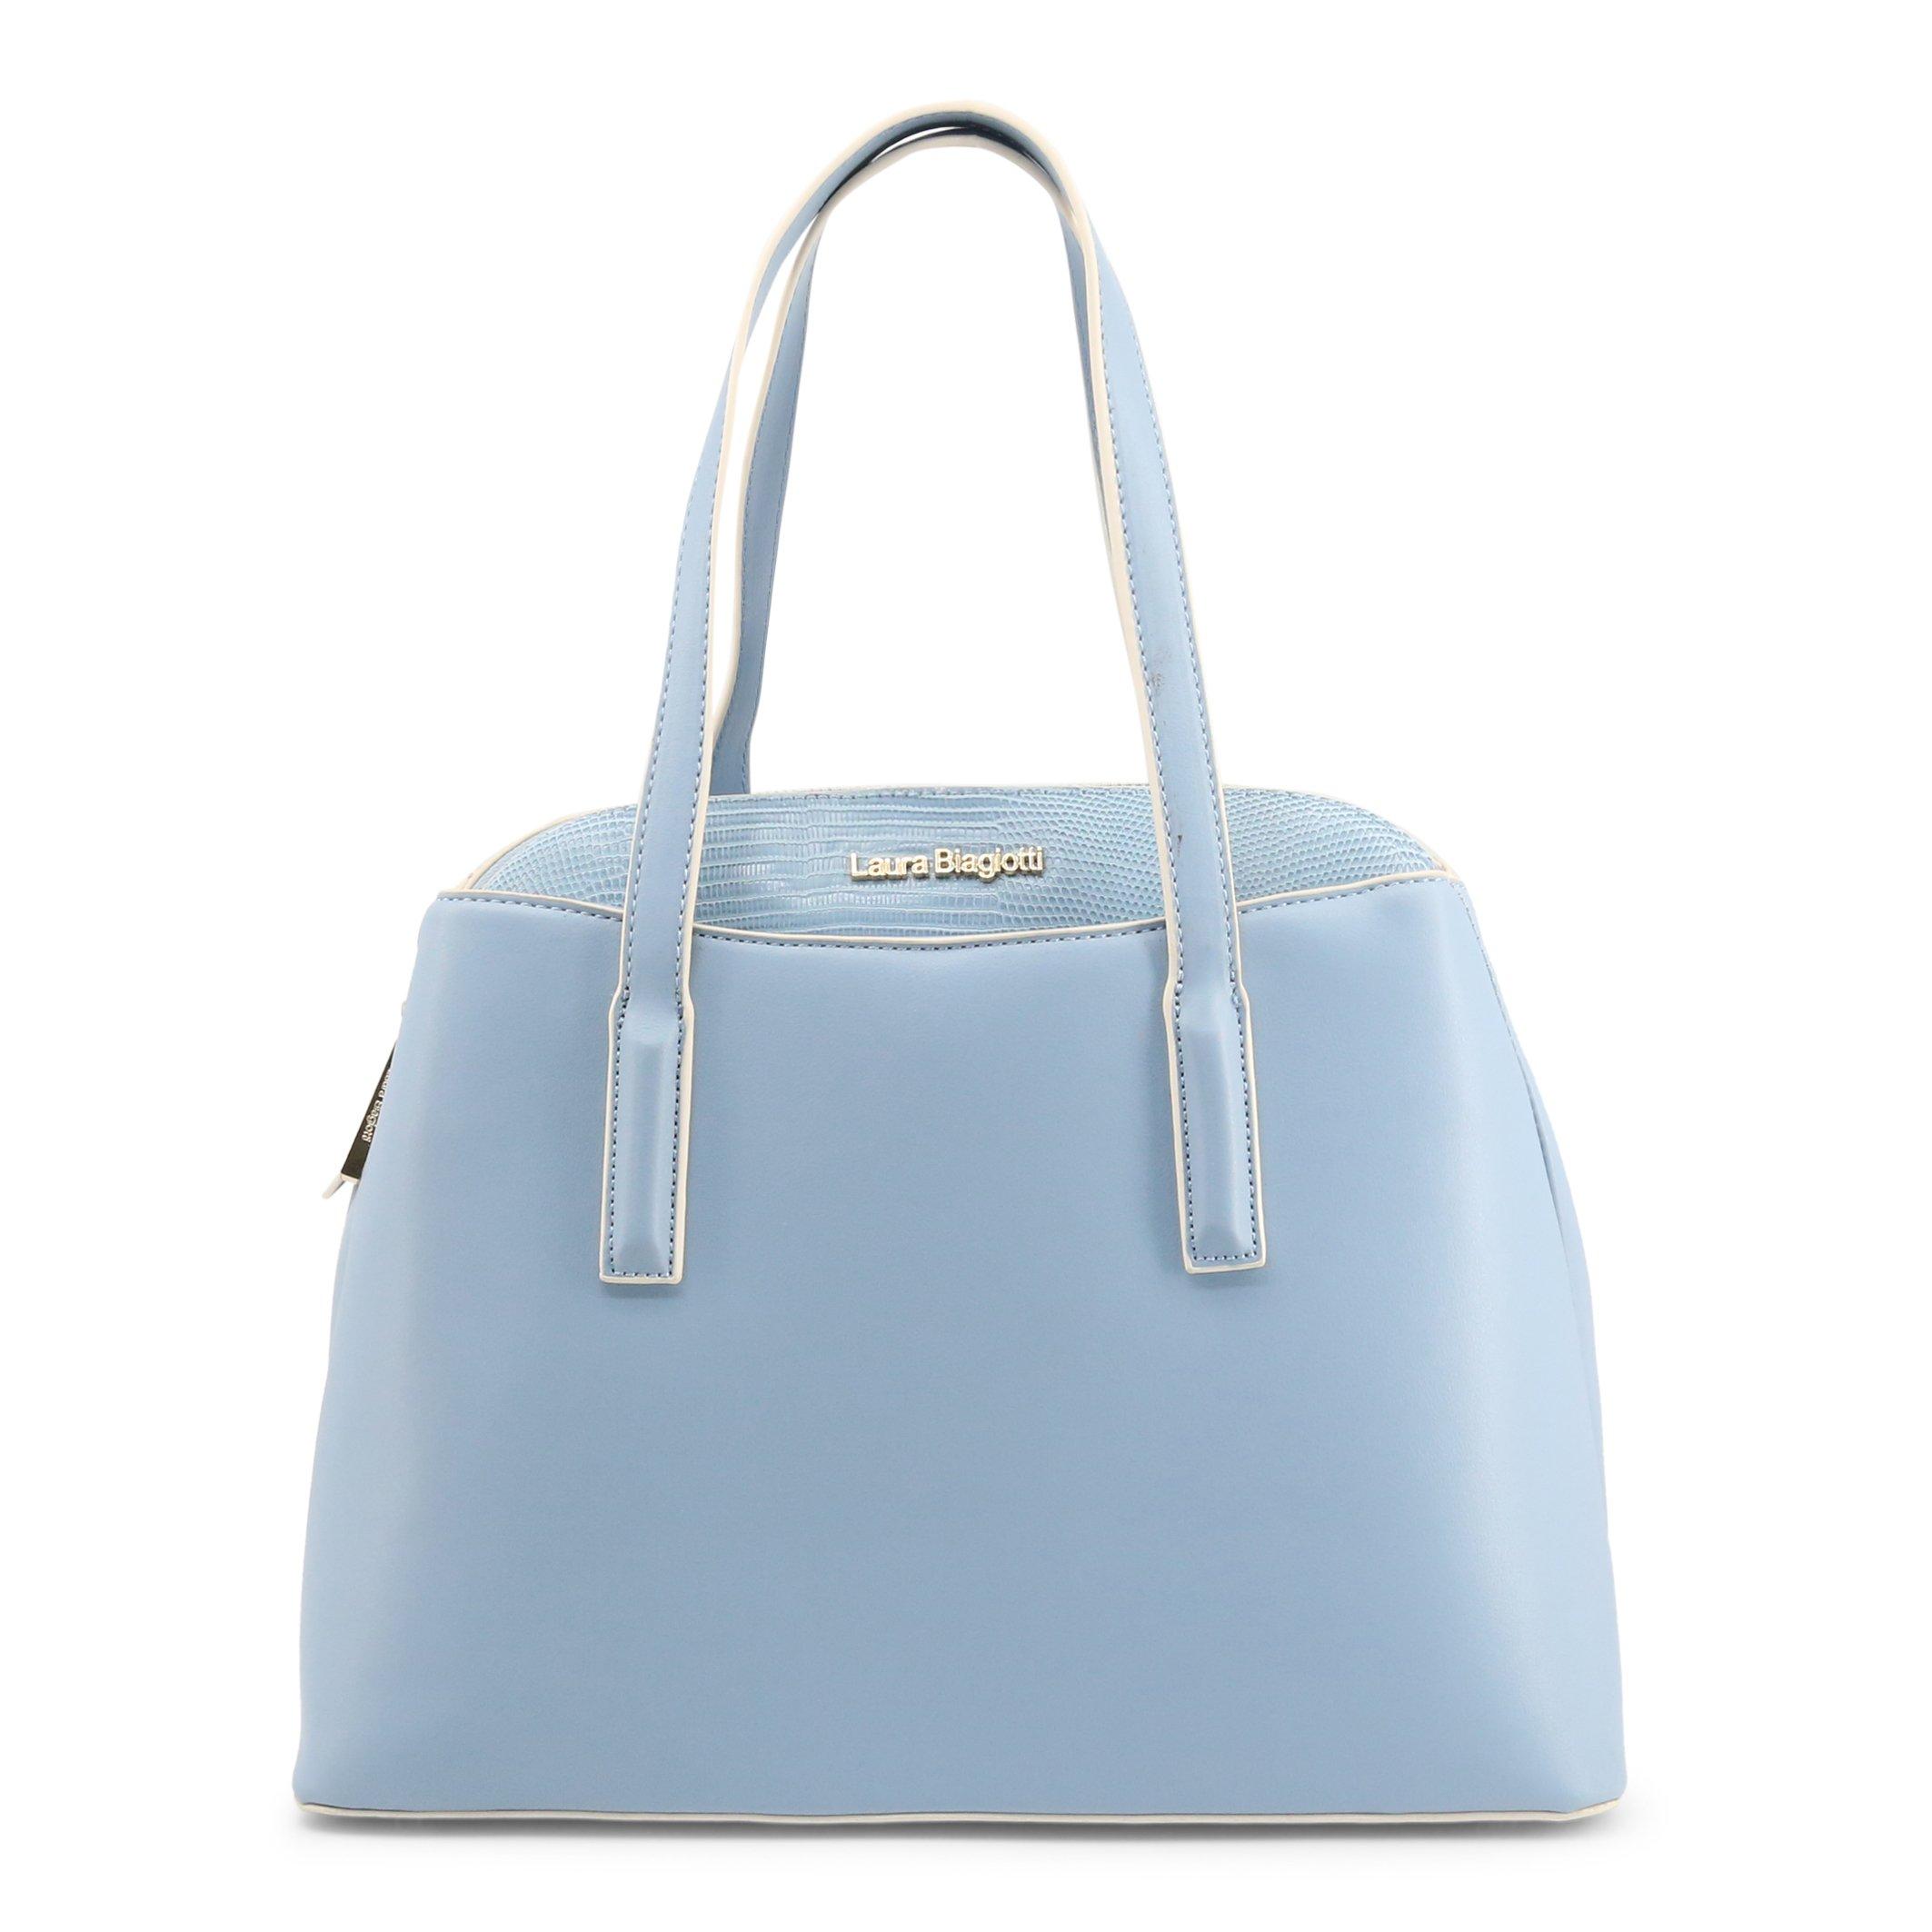 Laura Biagiotti Women's Shoulder Bag Various Colours Iza_112-1 - blue NOSIZE